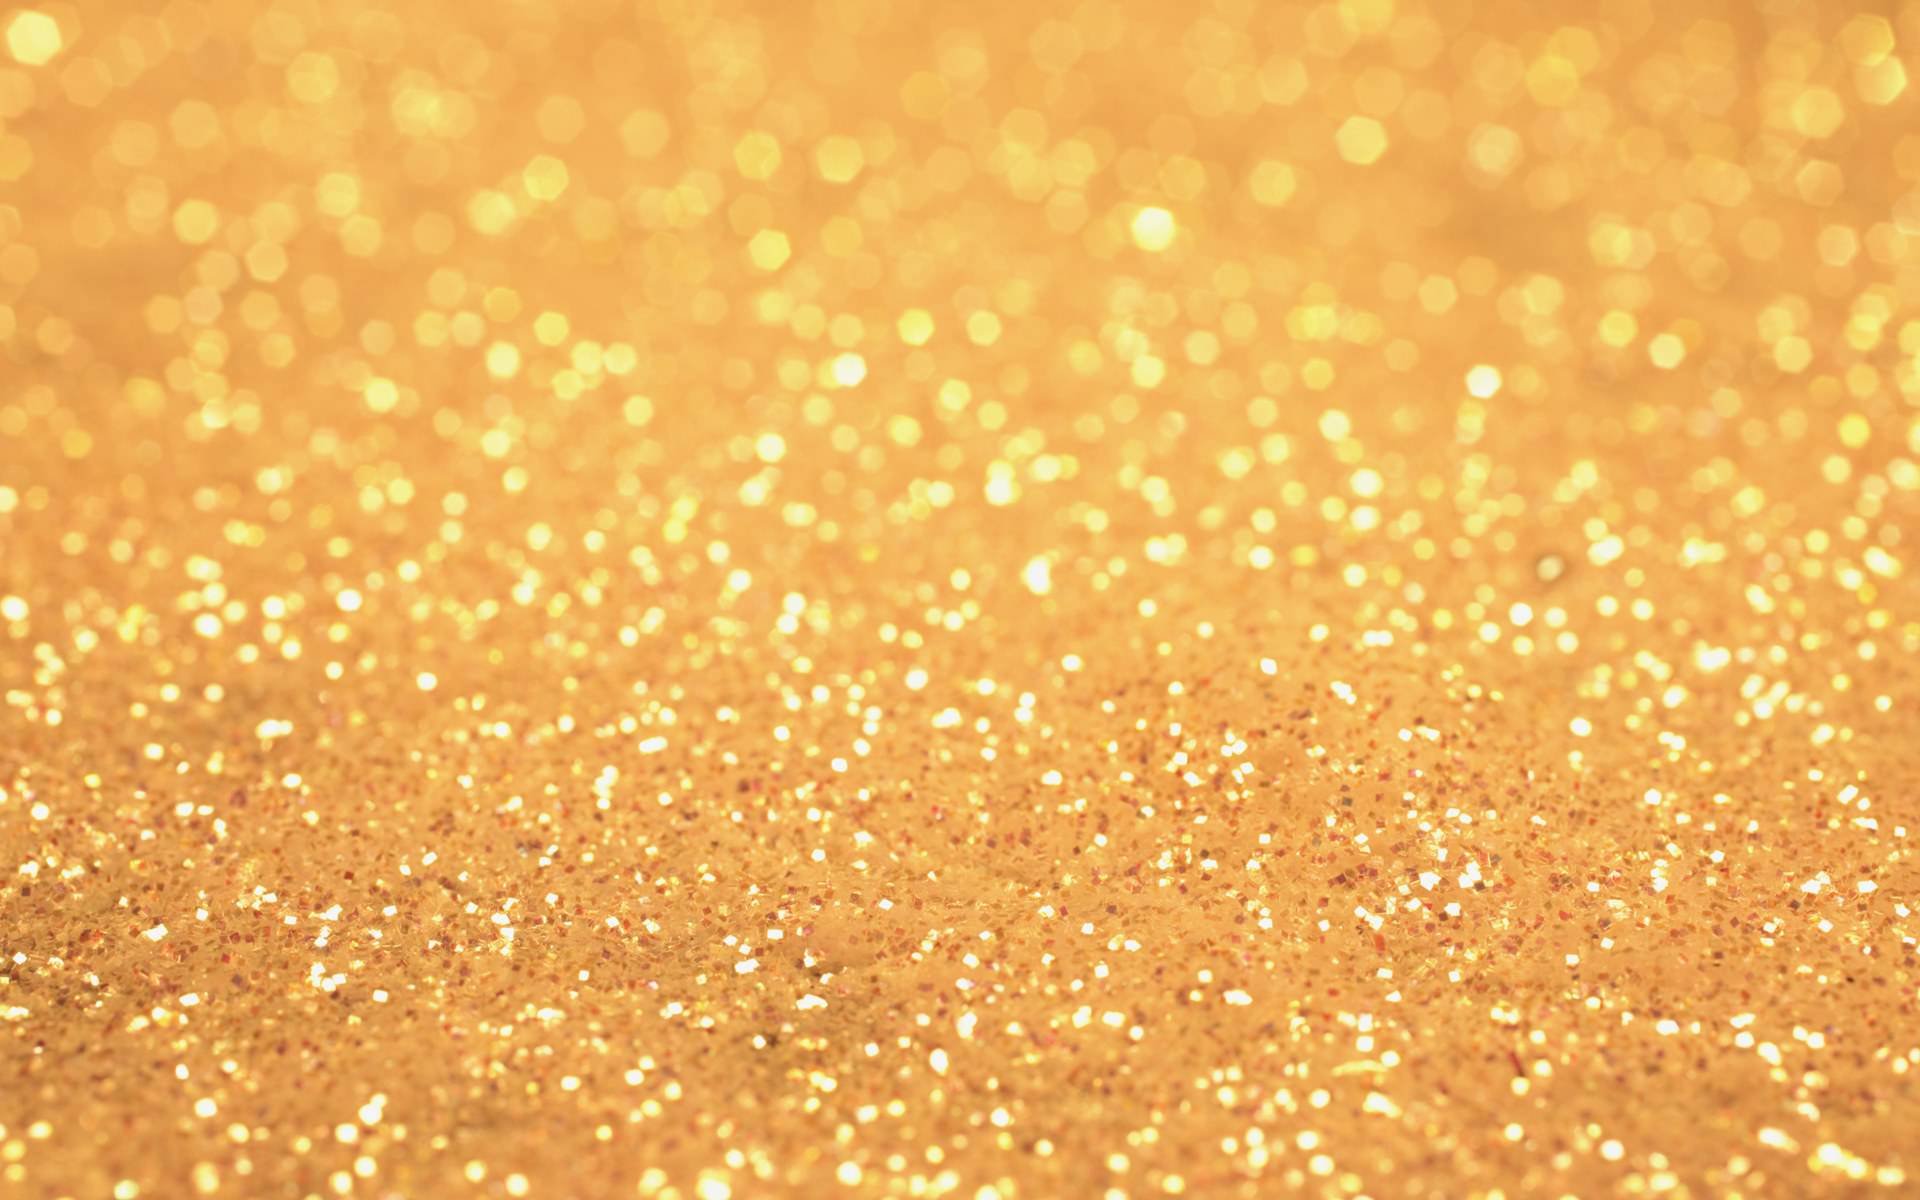 25 photoshop glitter patterns textures backgrounds images design - 25 Sparkle Backgrounds Wallpaper Pictures Images